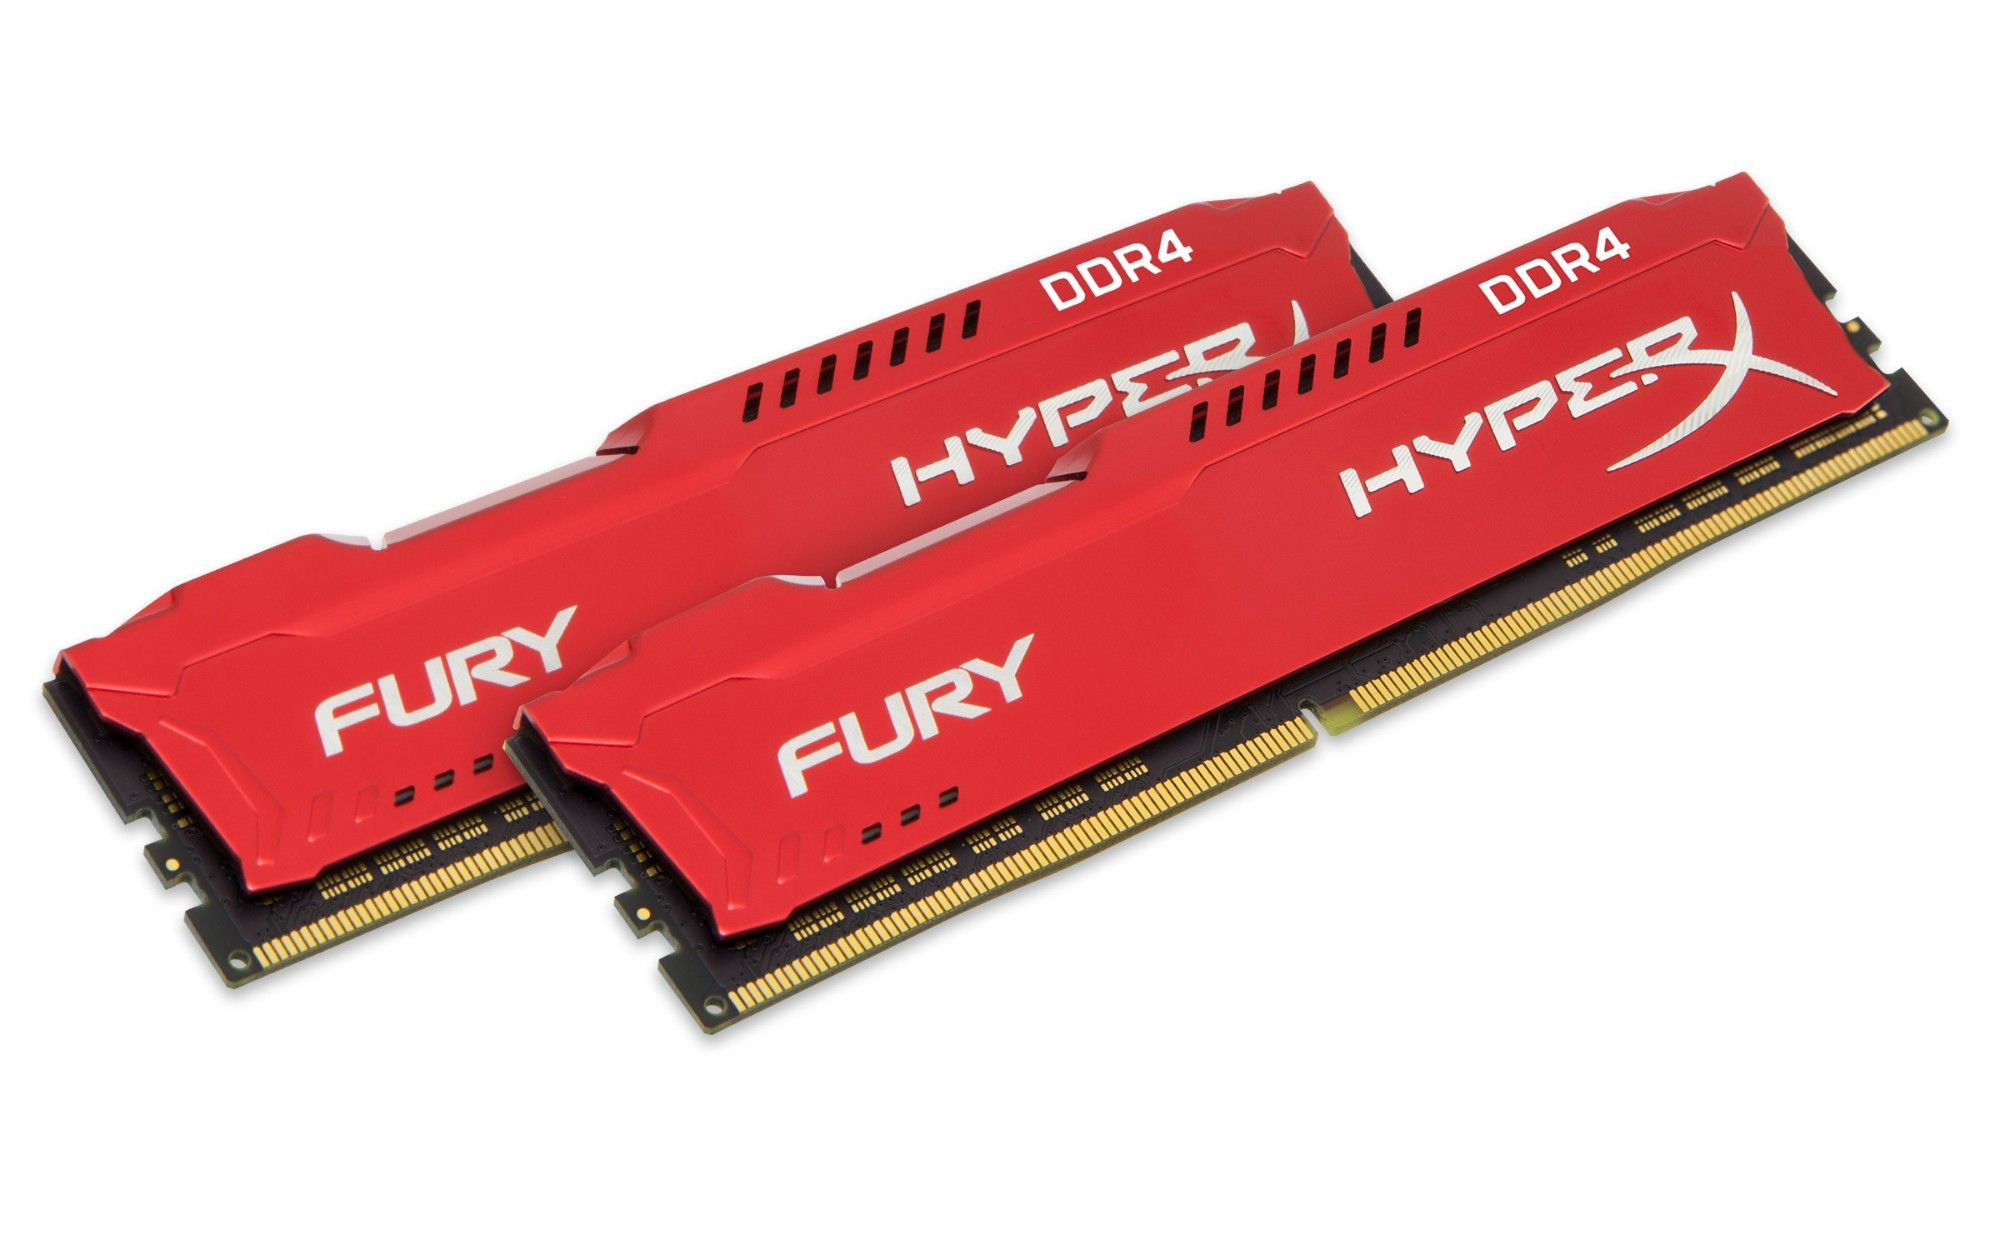 HyperX FURY Red 32GB DDR4 2666MHz Kit memory module